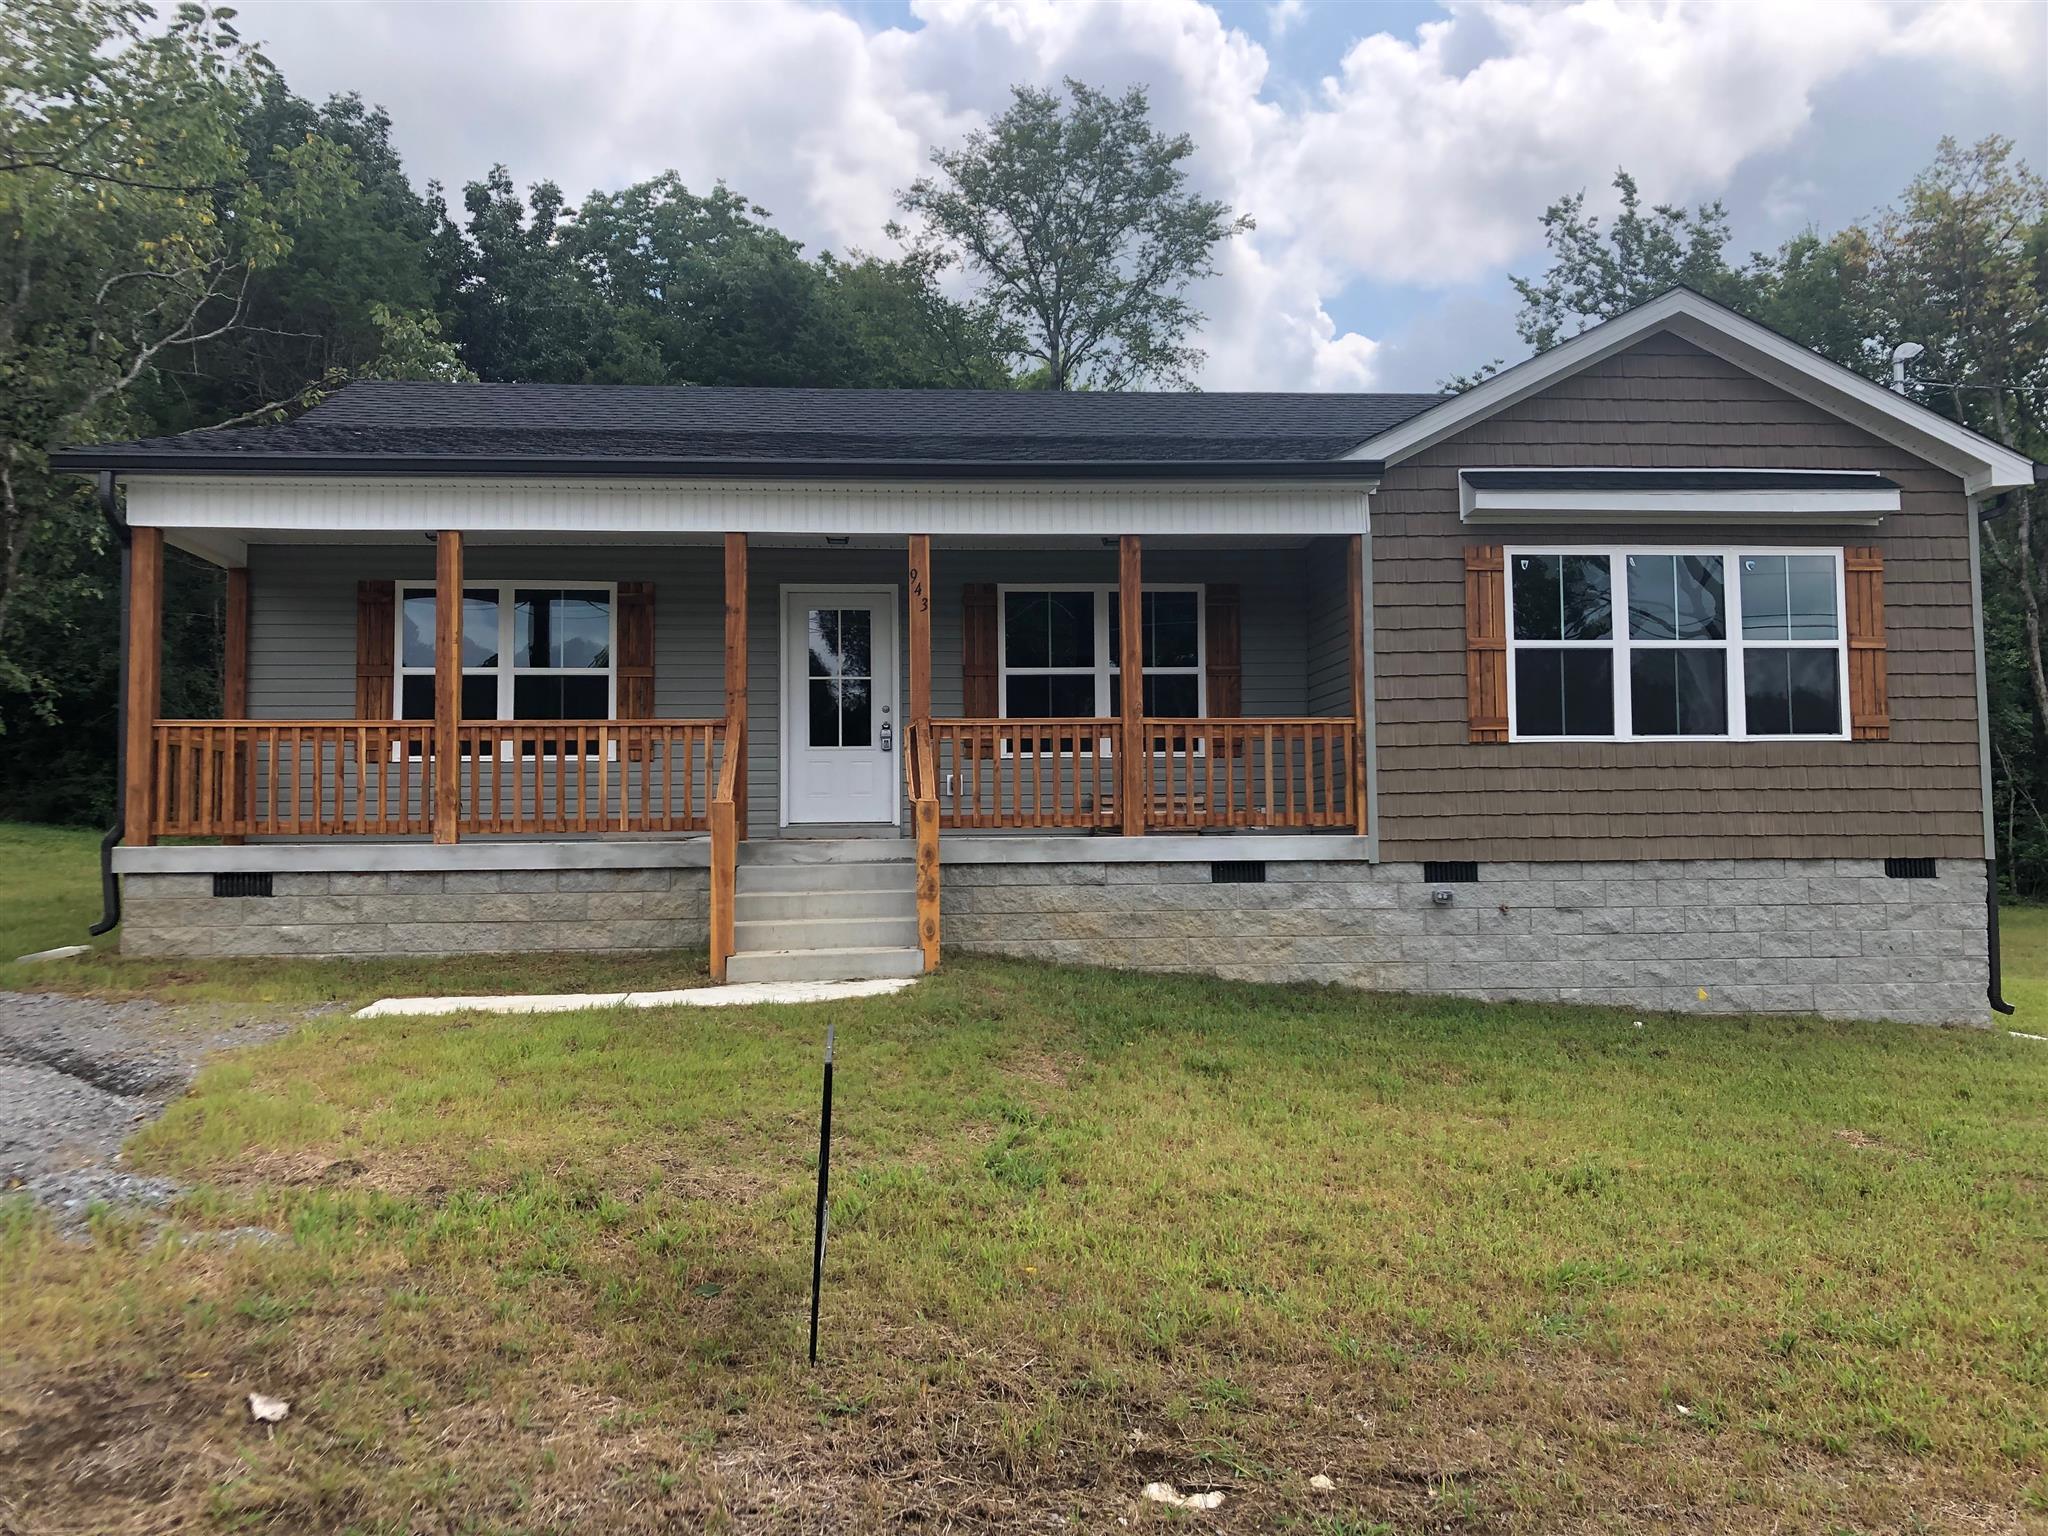 943 Wedgewood Dr, Lewisburg, TN 37091 - Lewisburg, TN real estate listing